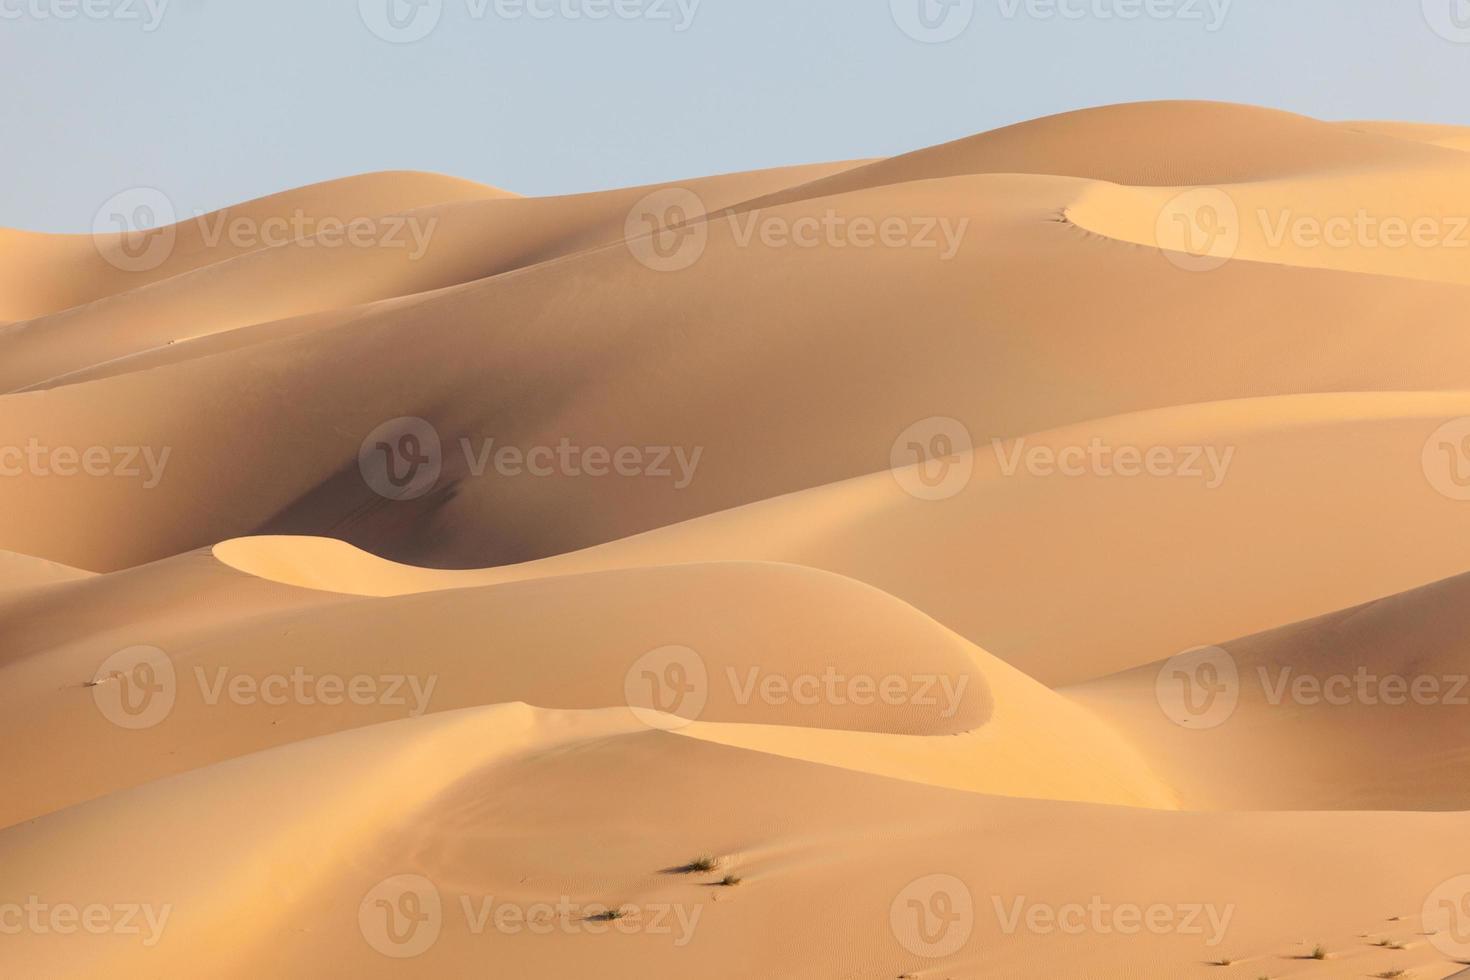 Dunes in the Empty Quarter desert photo